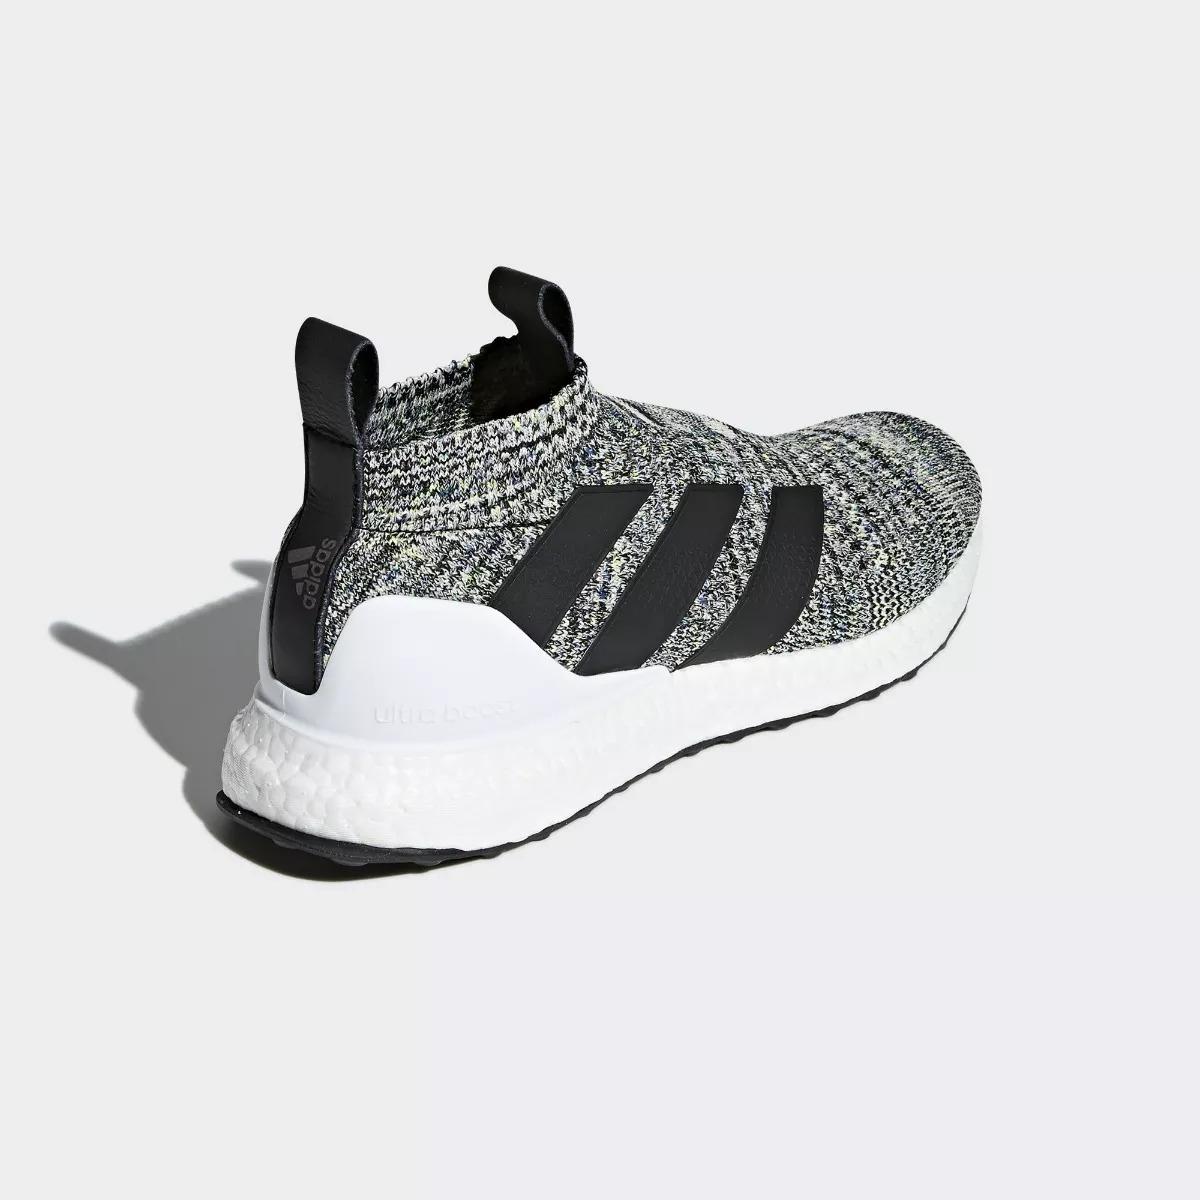 Zapatillas adidas Ace 16 Ultra Boost